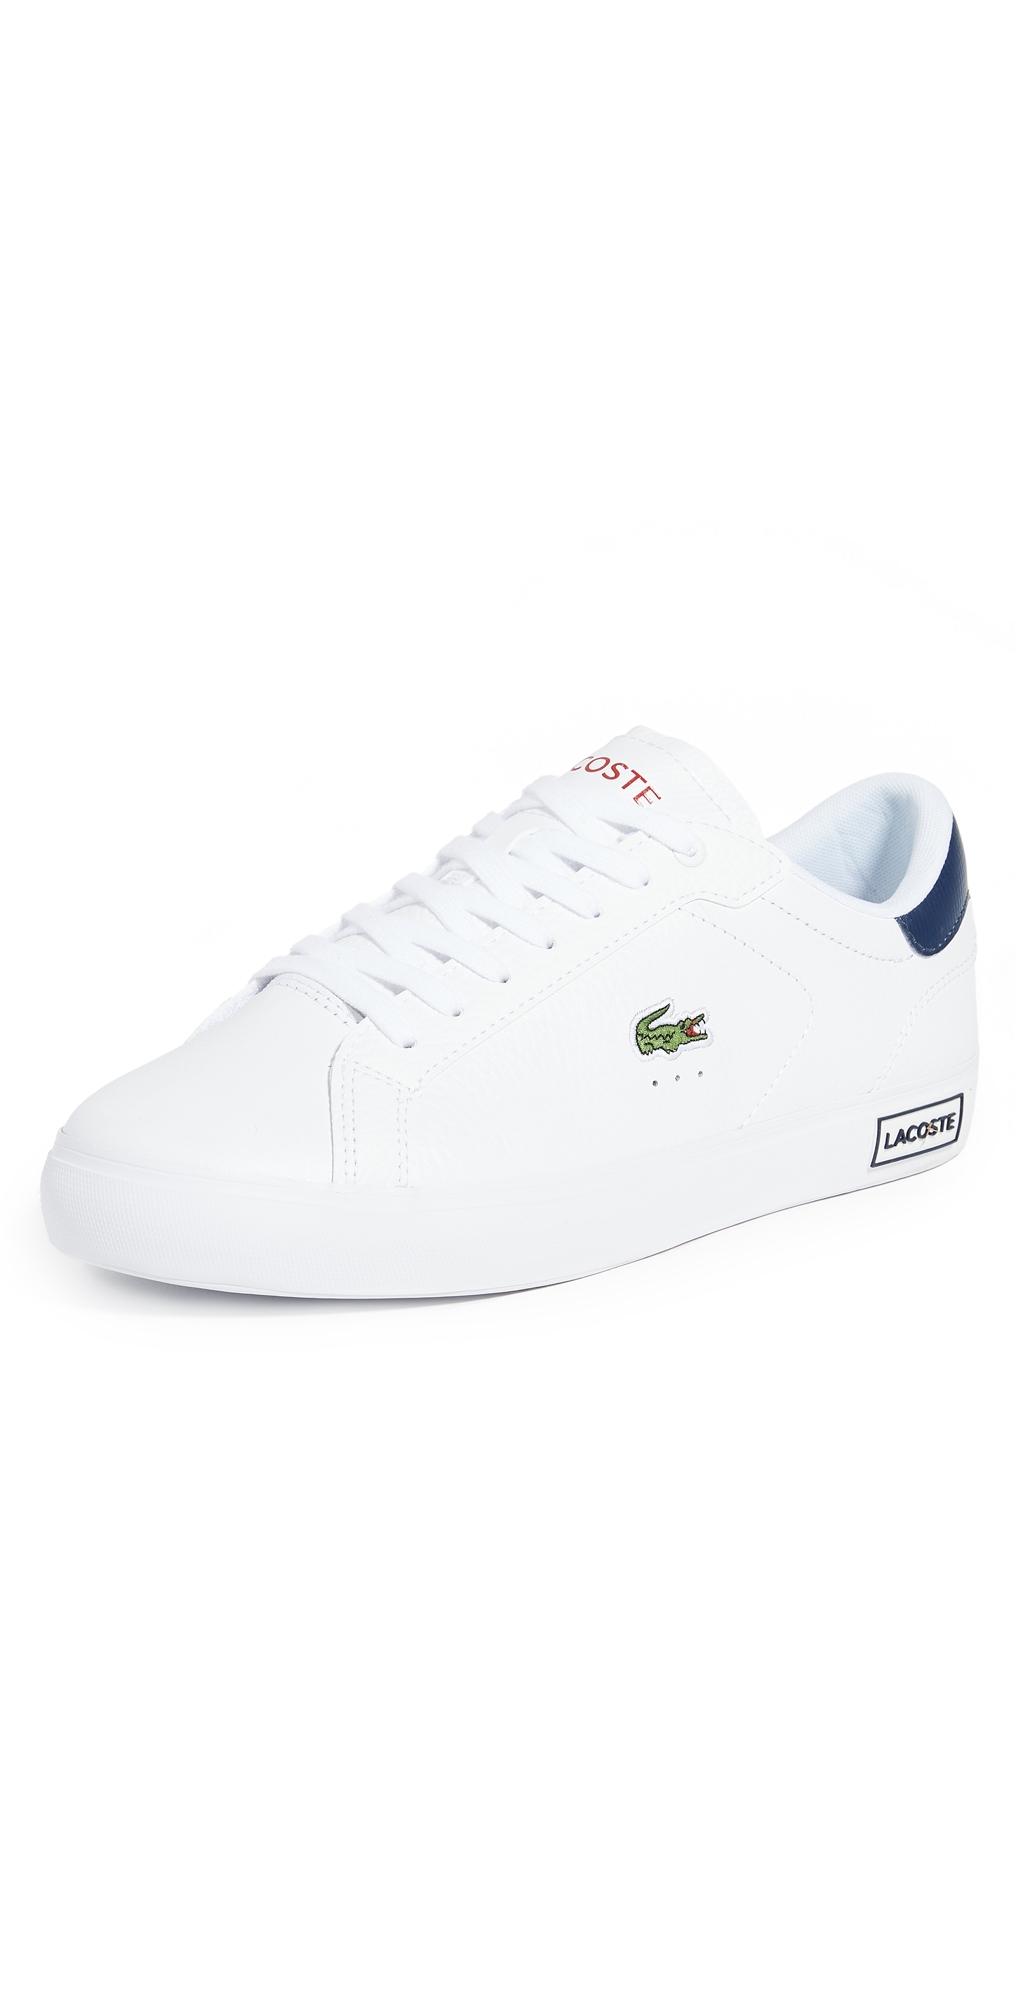 Lacoste Powercourt Sneakers